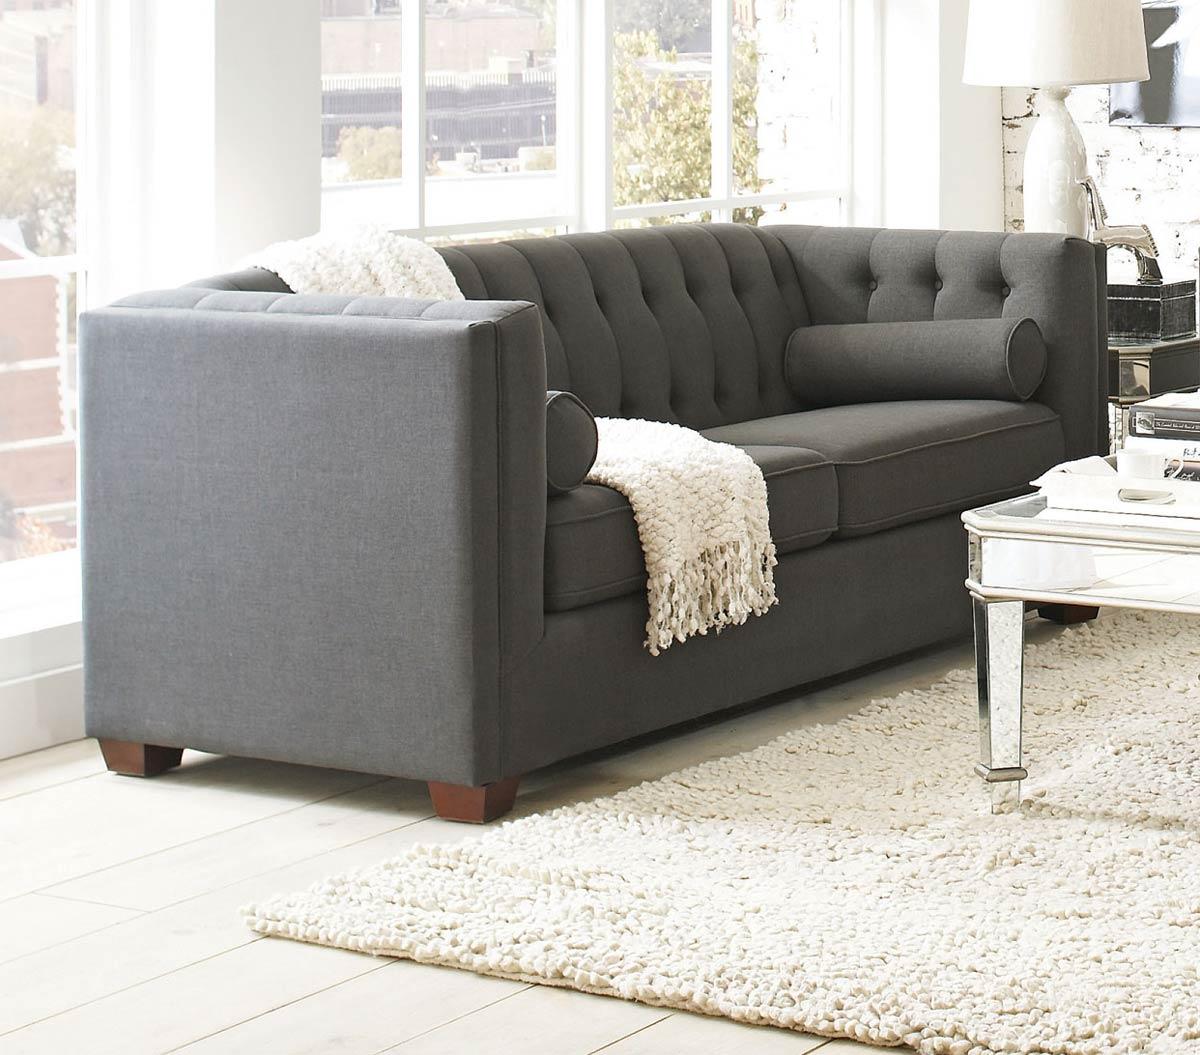 Coaster Cairns Sofa - Charcoal/Brown